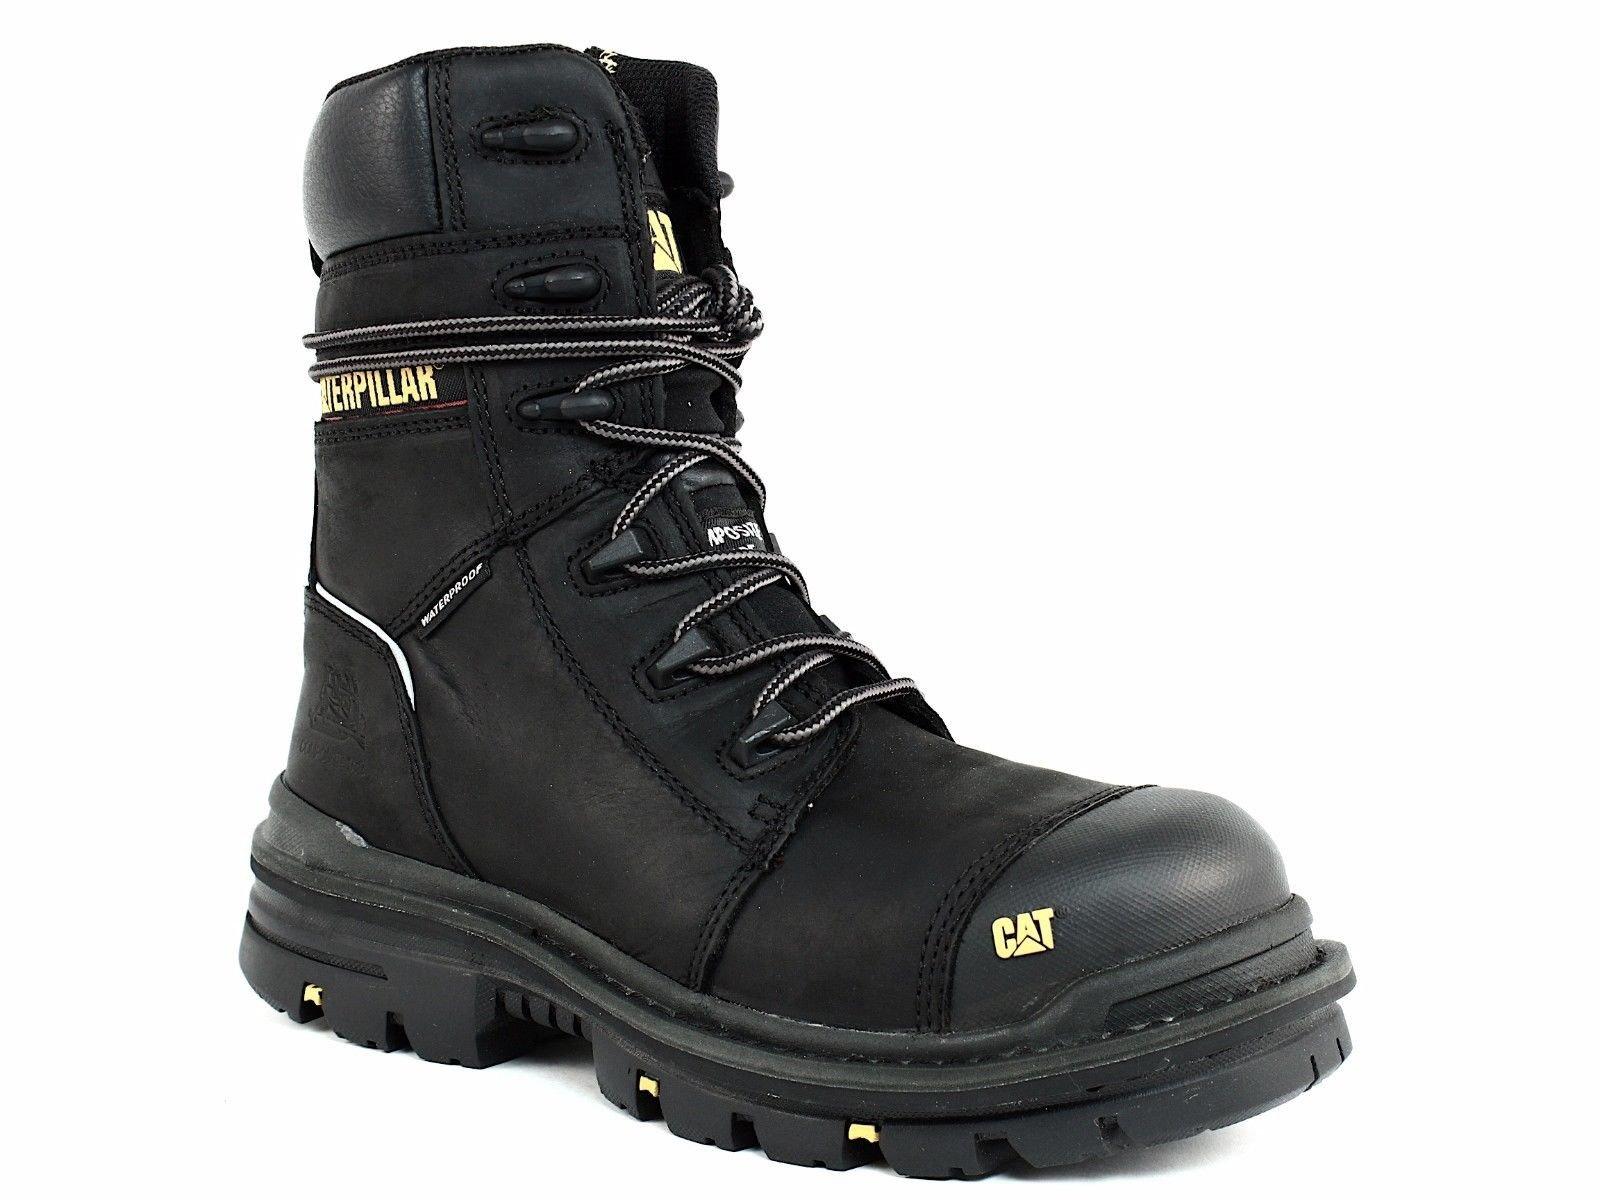 Caterpillar Men's Mortise 8'' Waterproof Work Boot Composite Toe Black 11.5 D(M) US